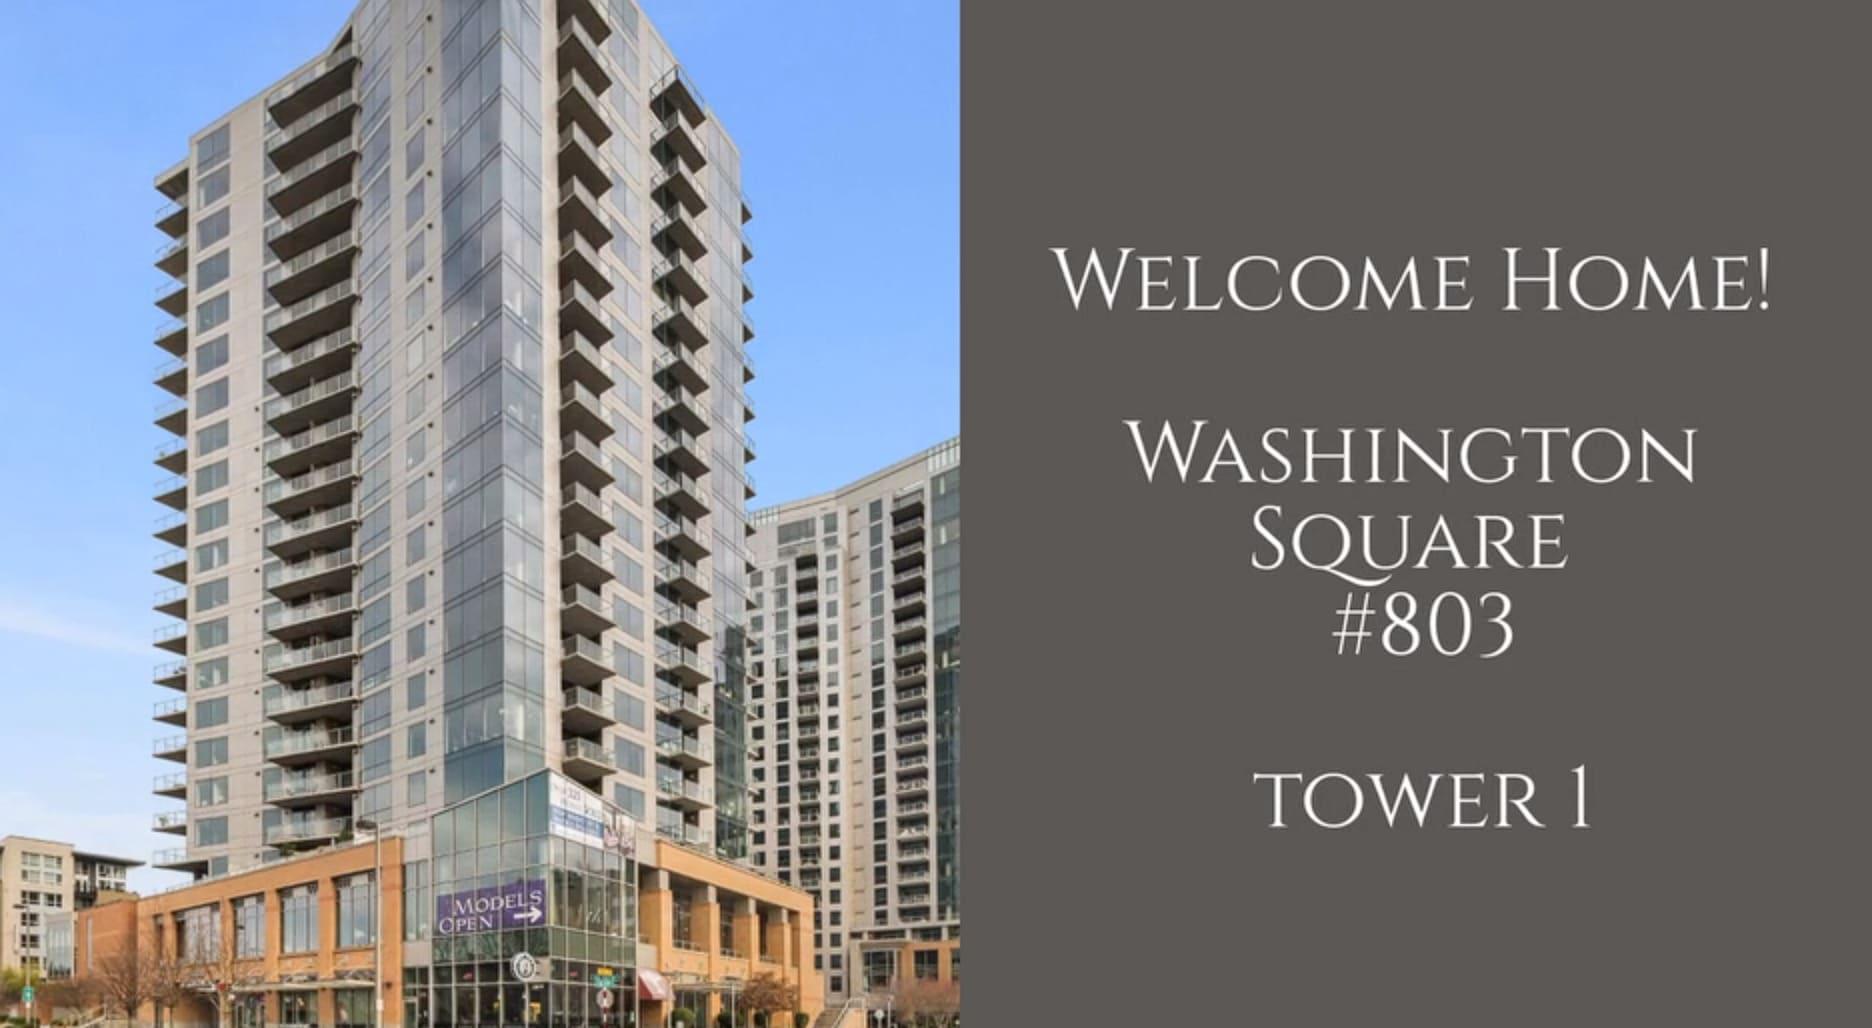 Washington Square #803 video preview